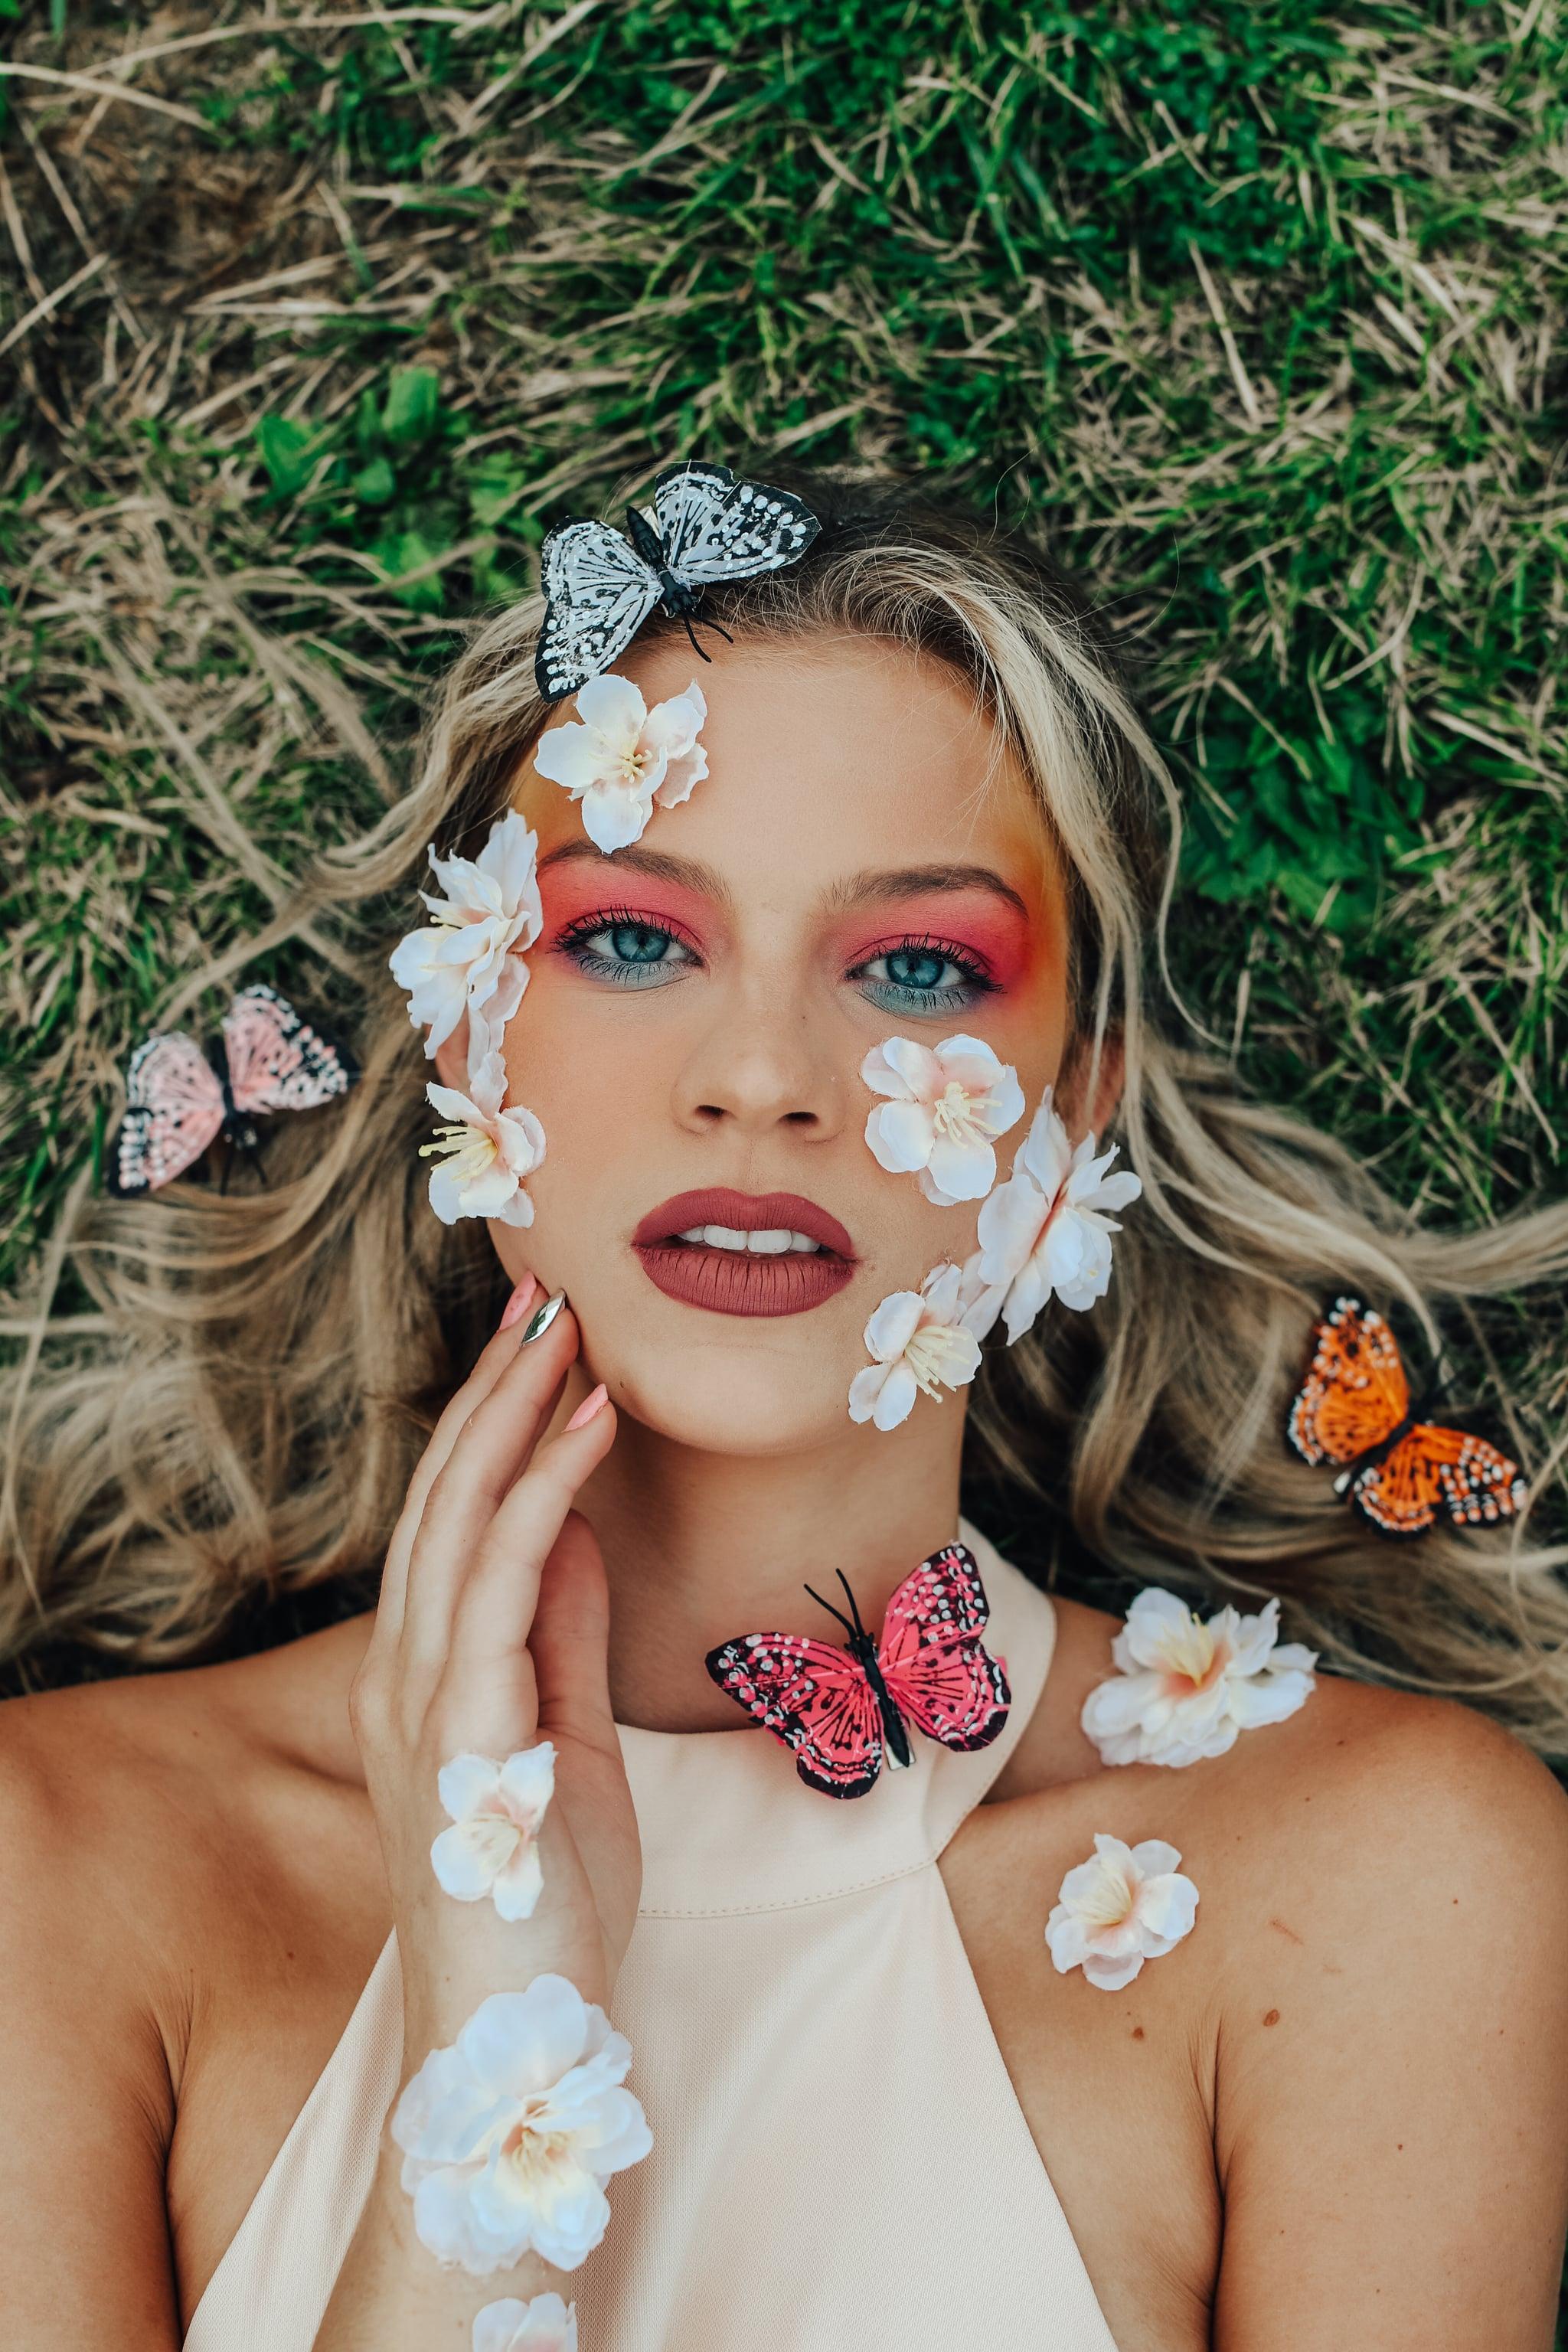 Makeup Artist Uses TikTok to Educate on Ulcerative Colitis 4